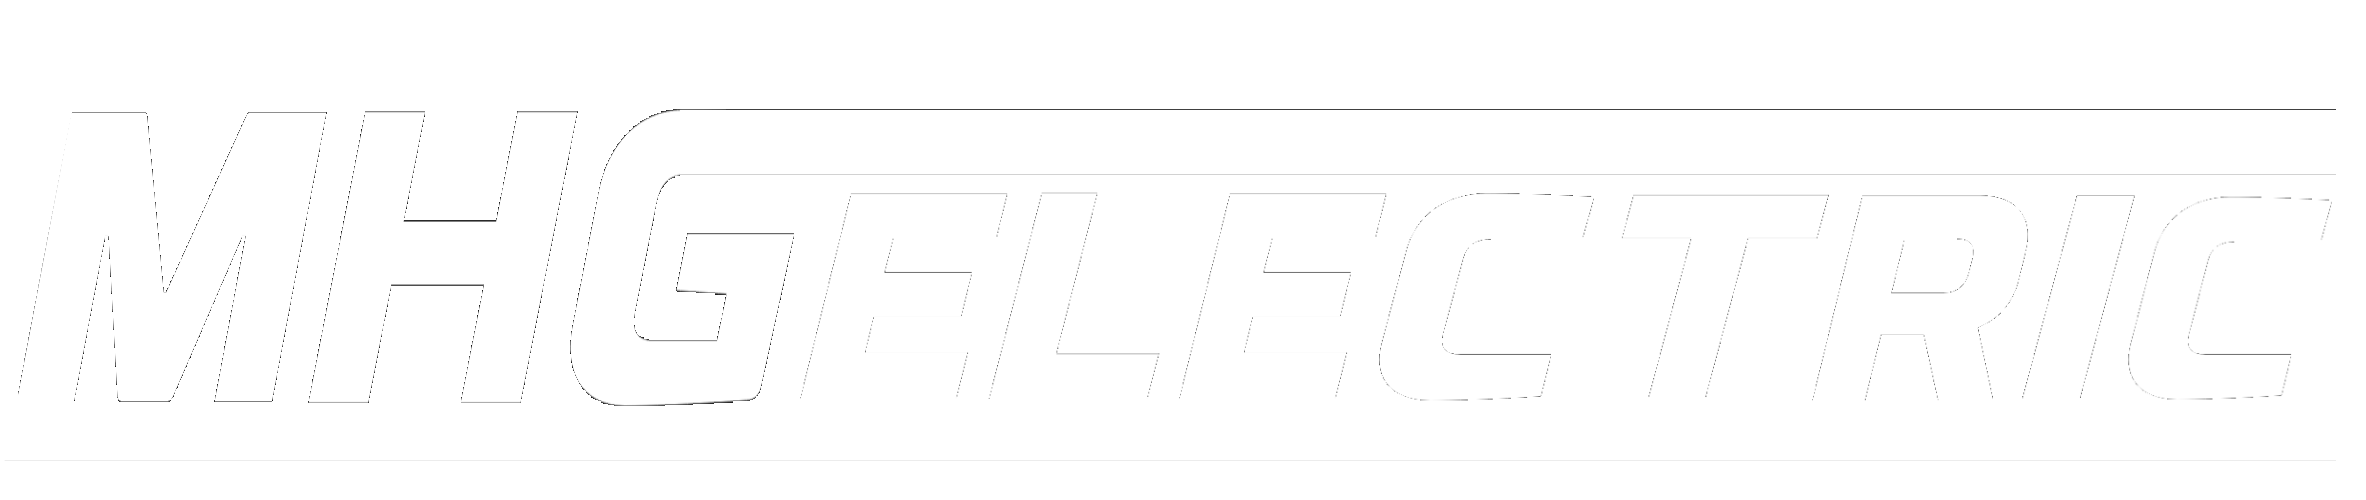 MHG Electric